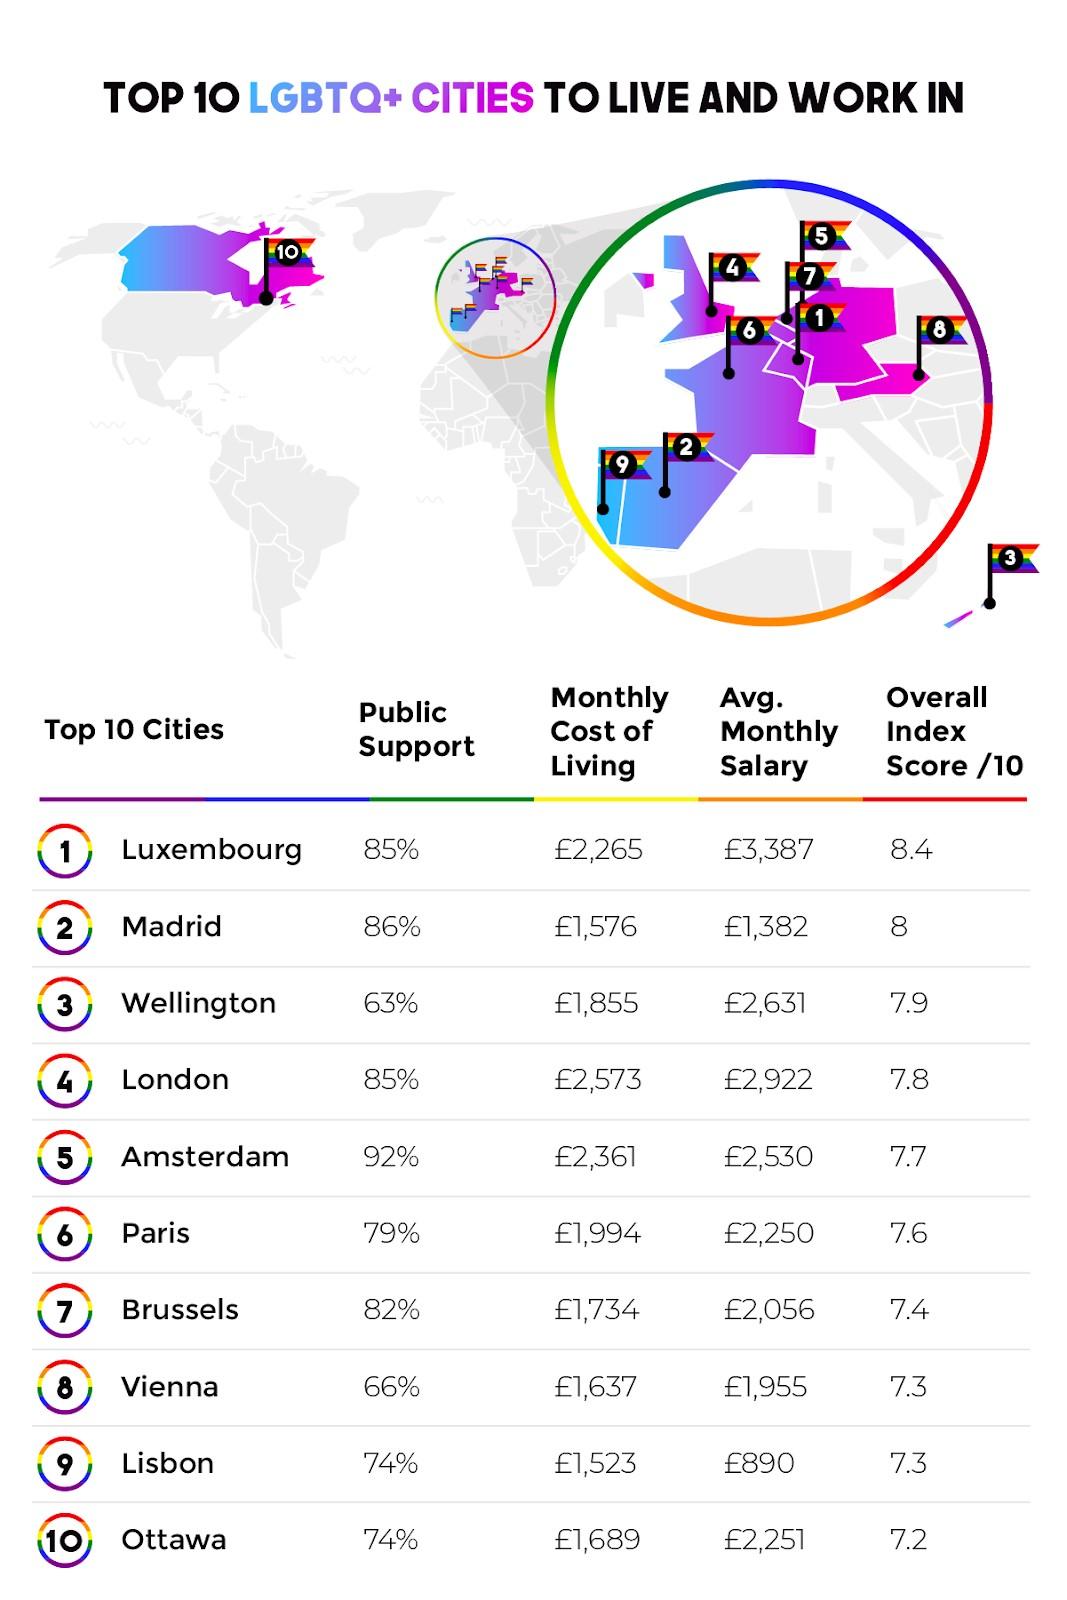 Top 10 ciudades LGBTQ